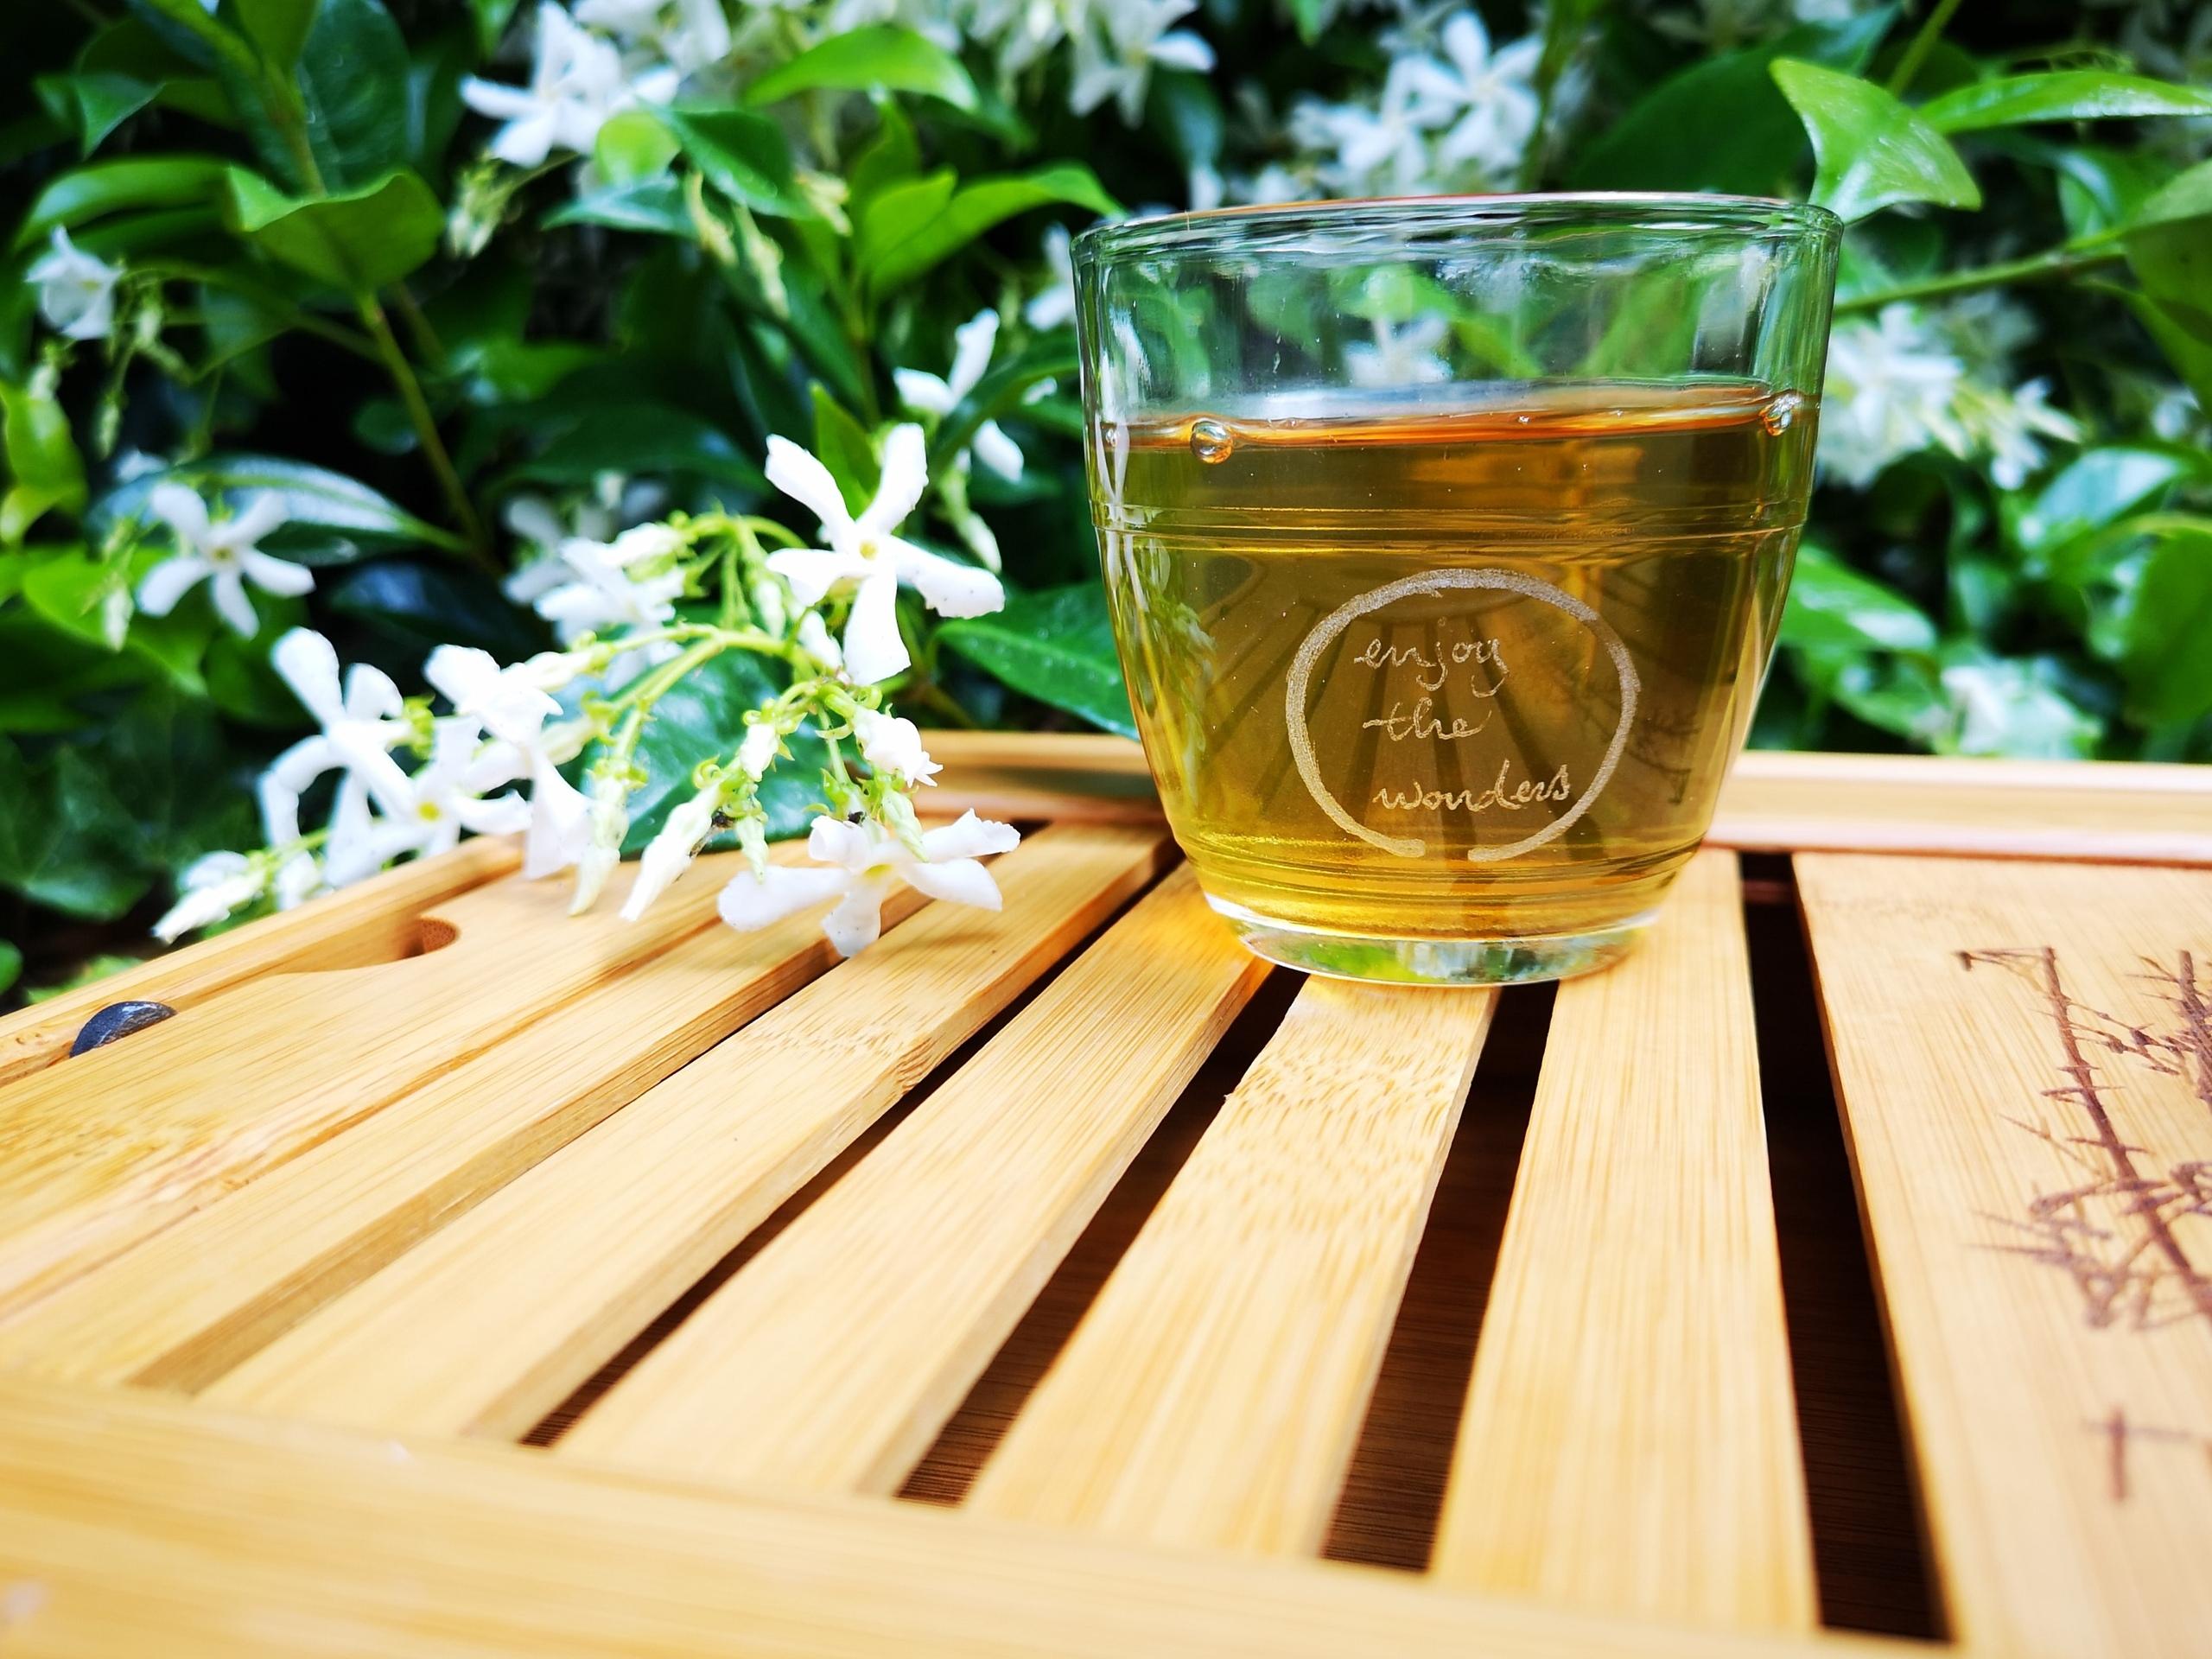 Добавка к чаю ЖАСМИН или чай с Жасмином.